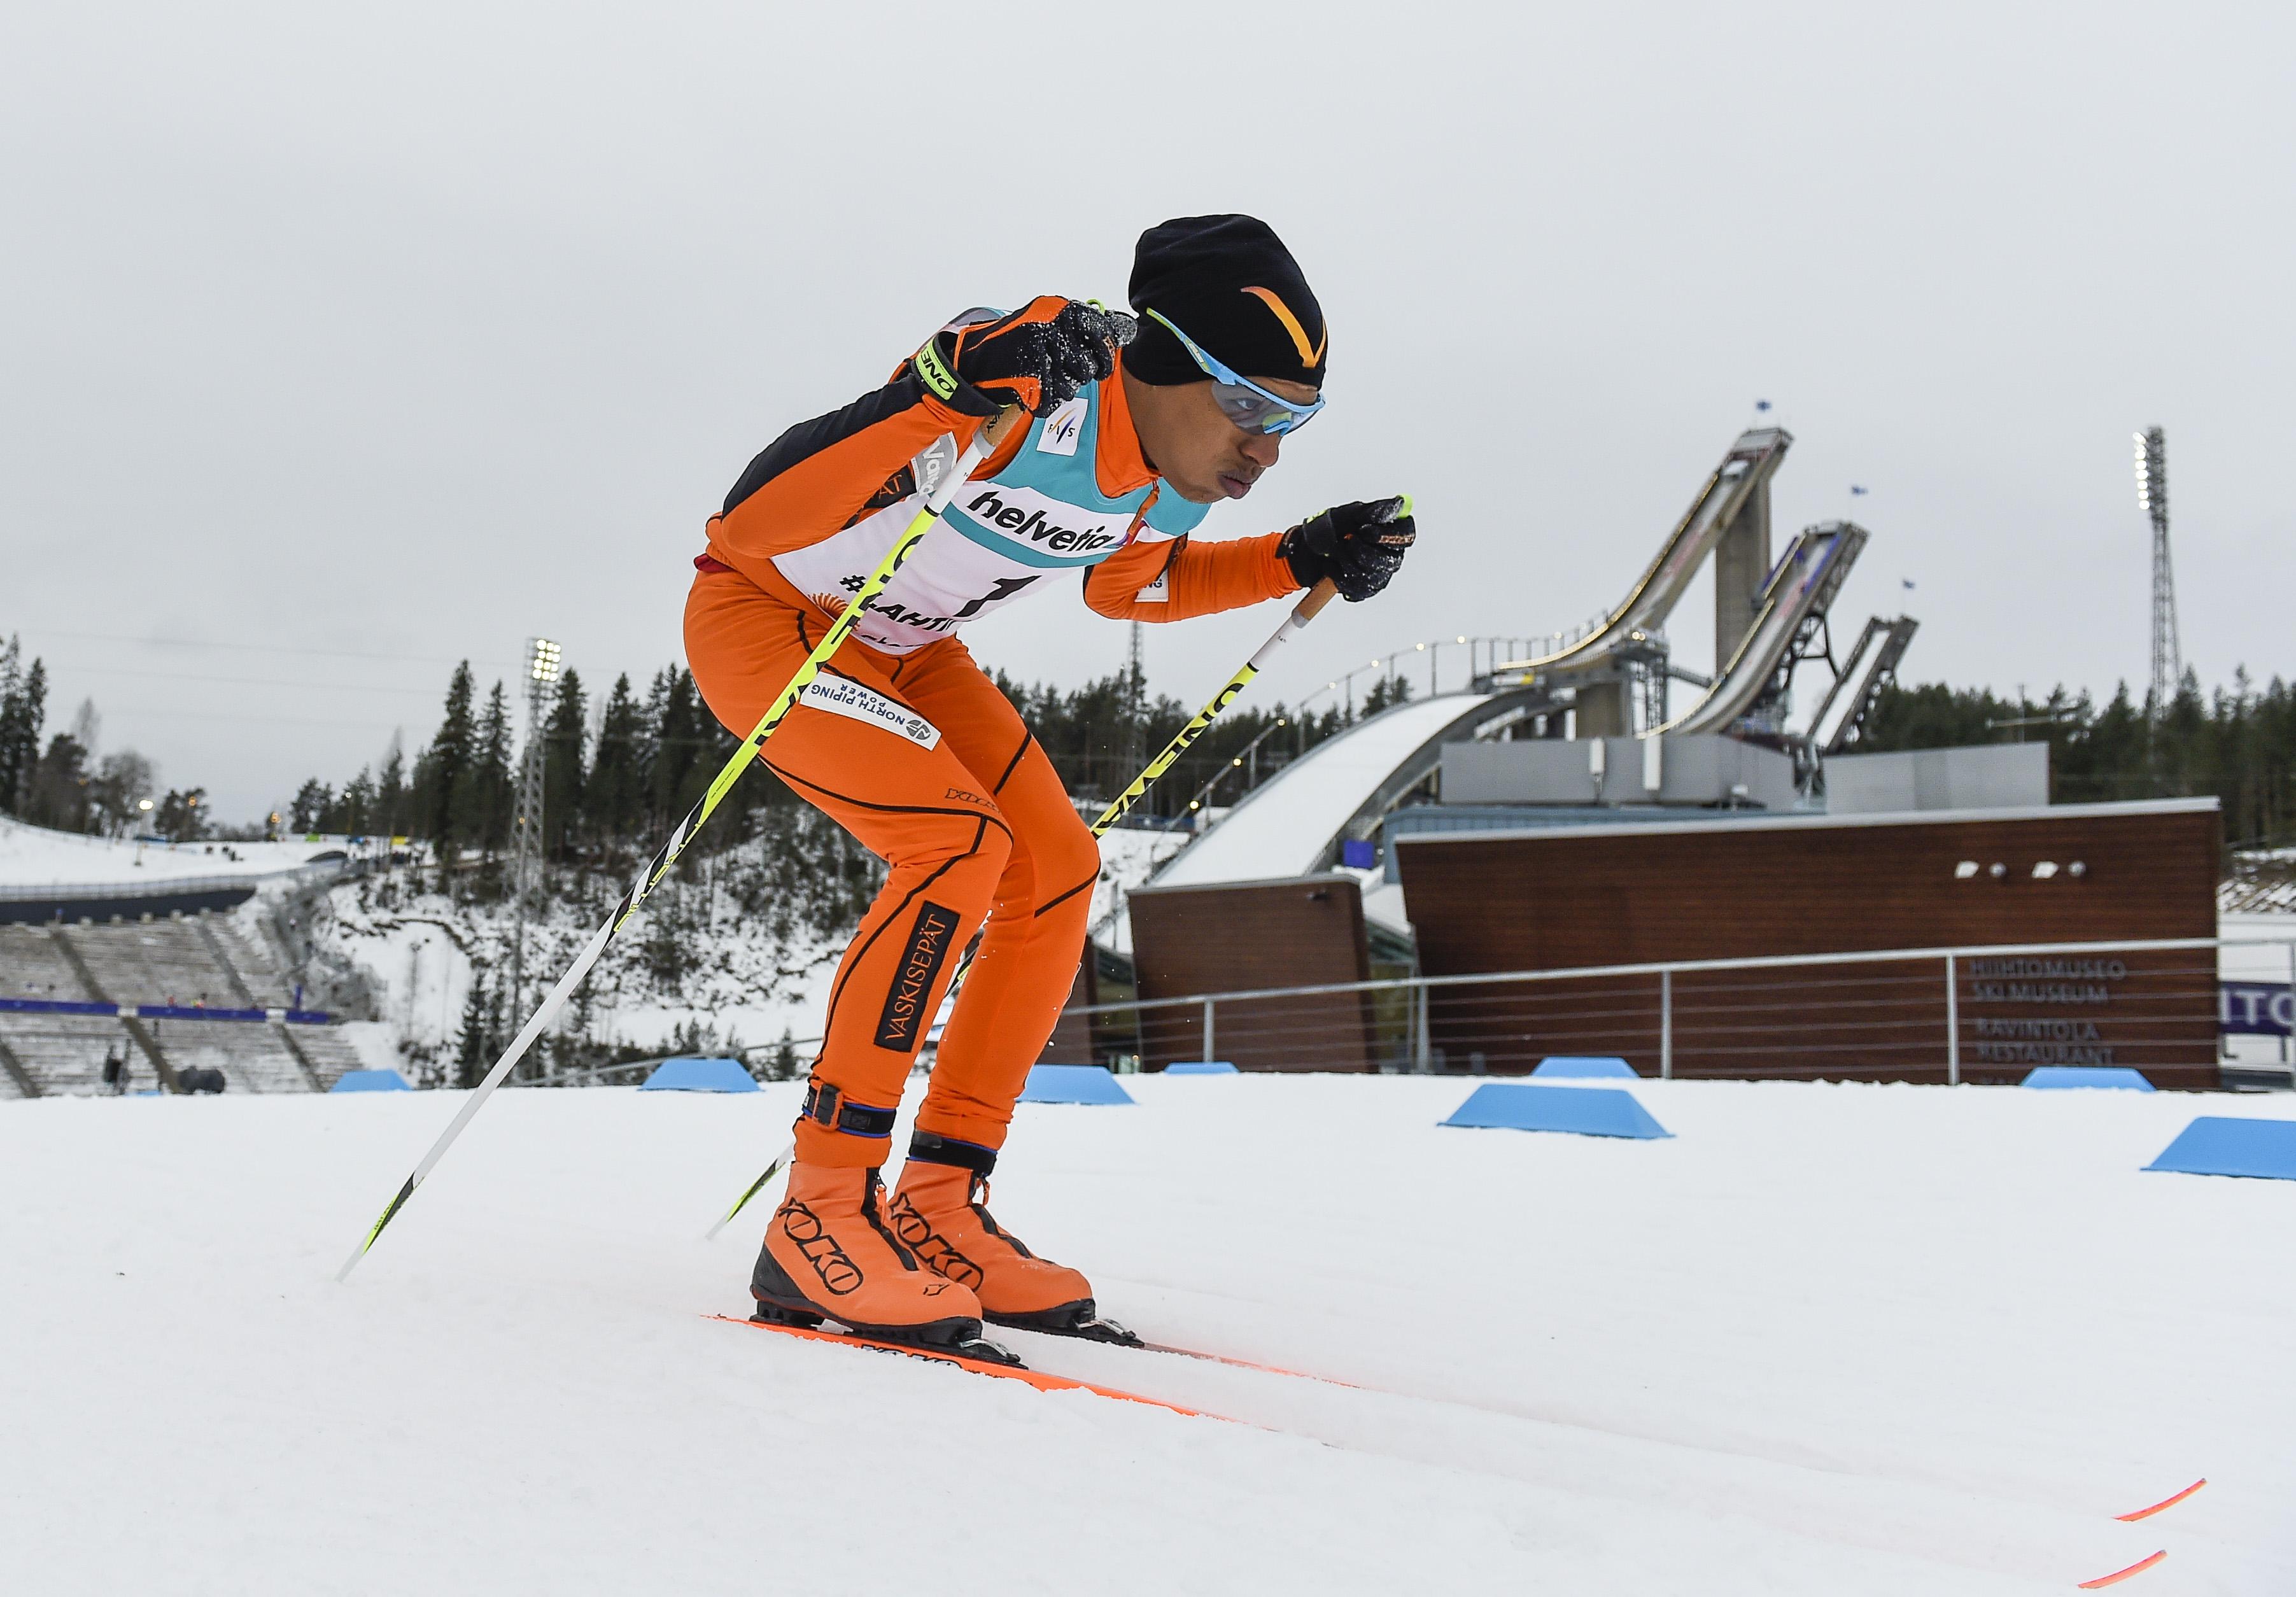 Adrián Solano enfrentándose por primera vez a la nieve.